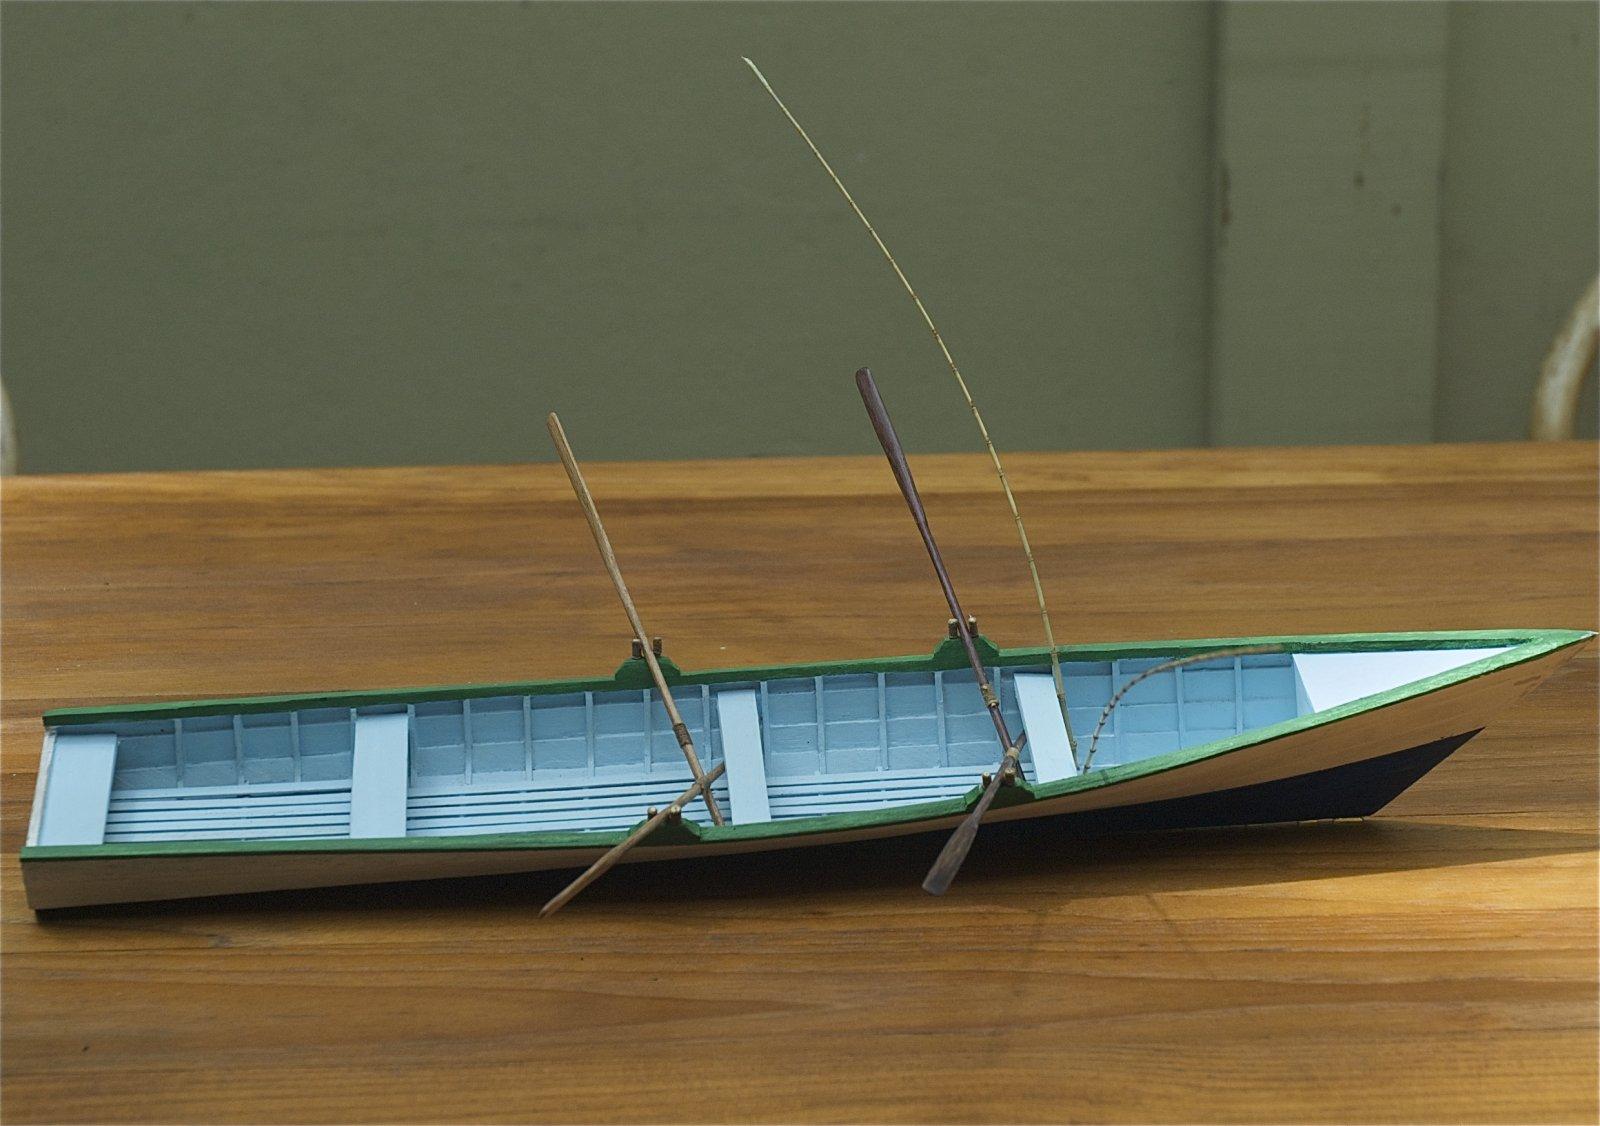 DSC-3493.jpg